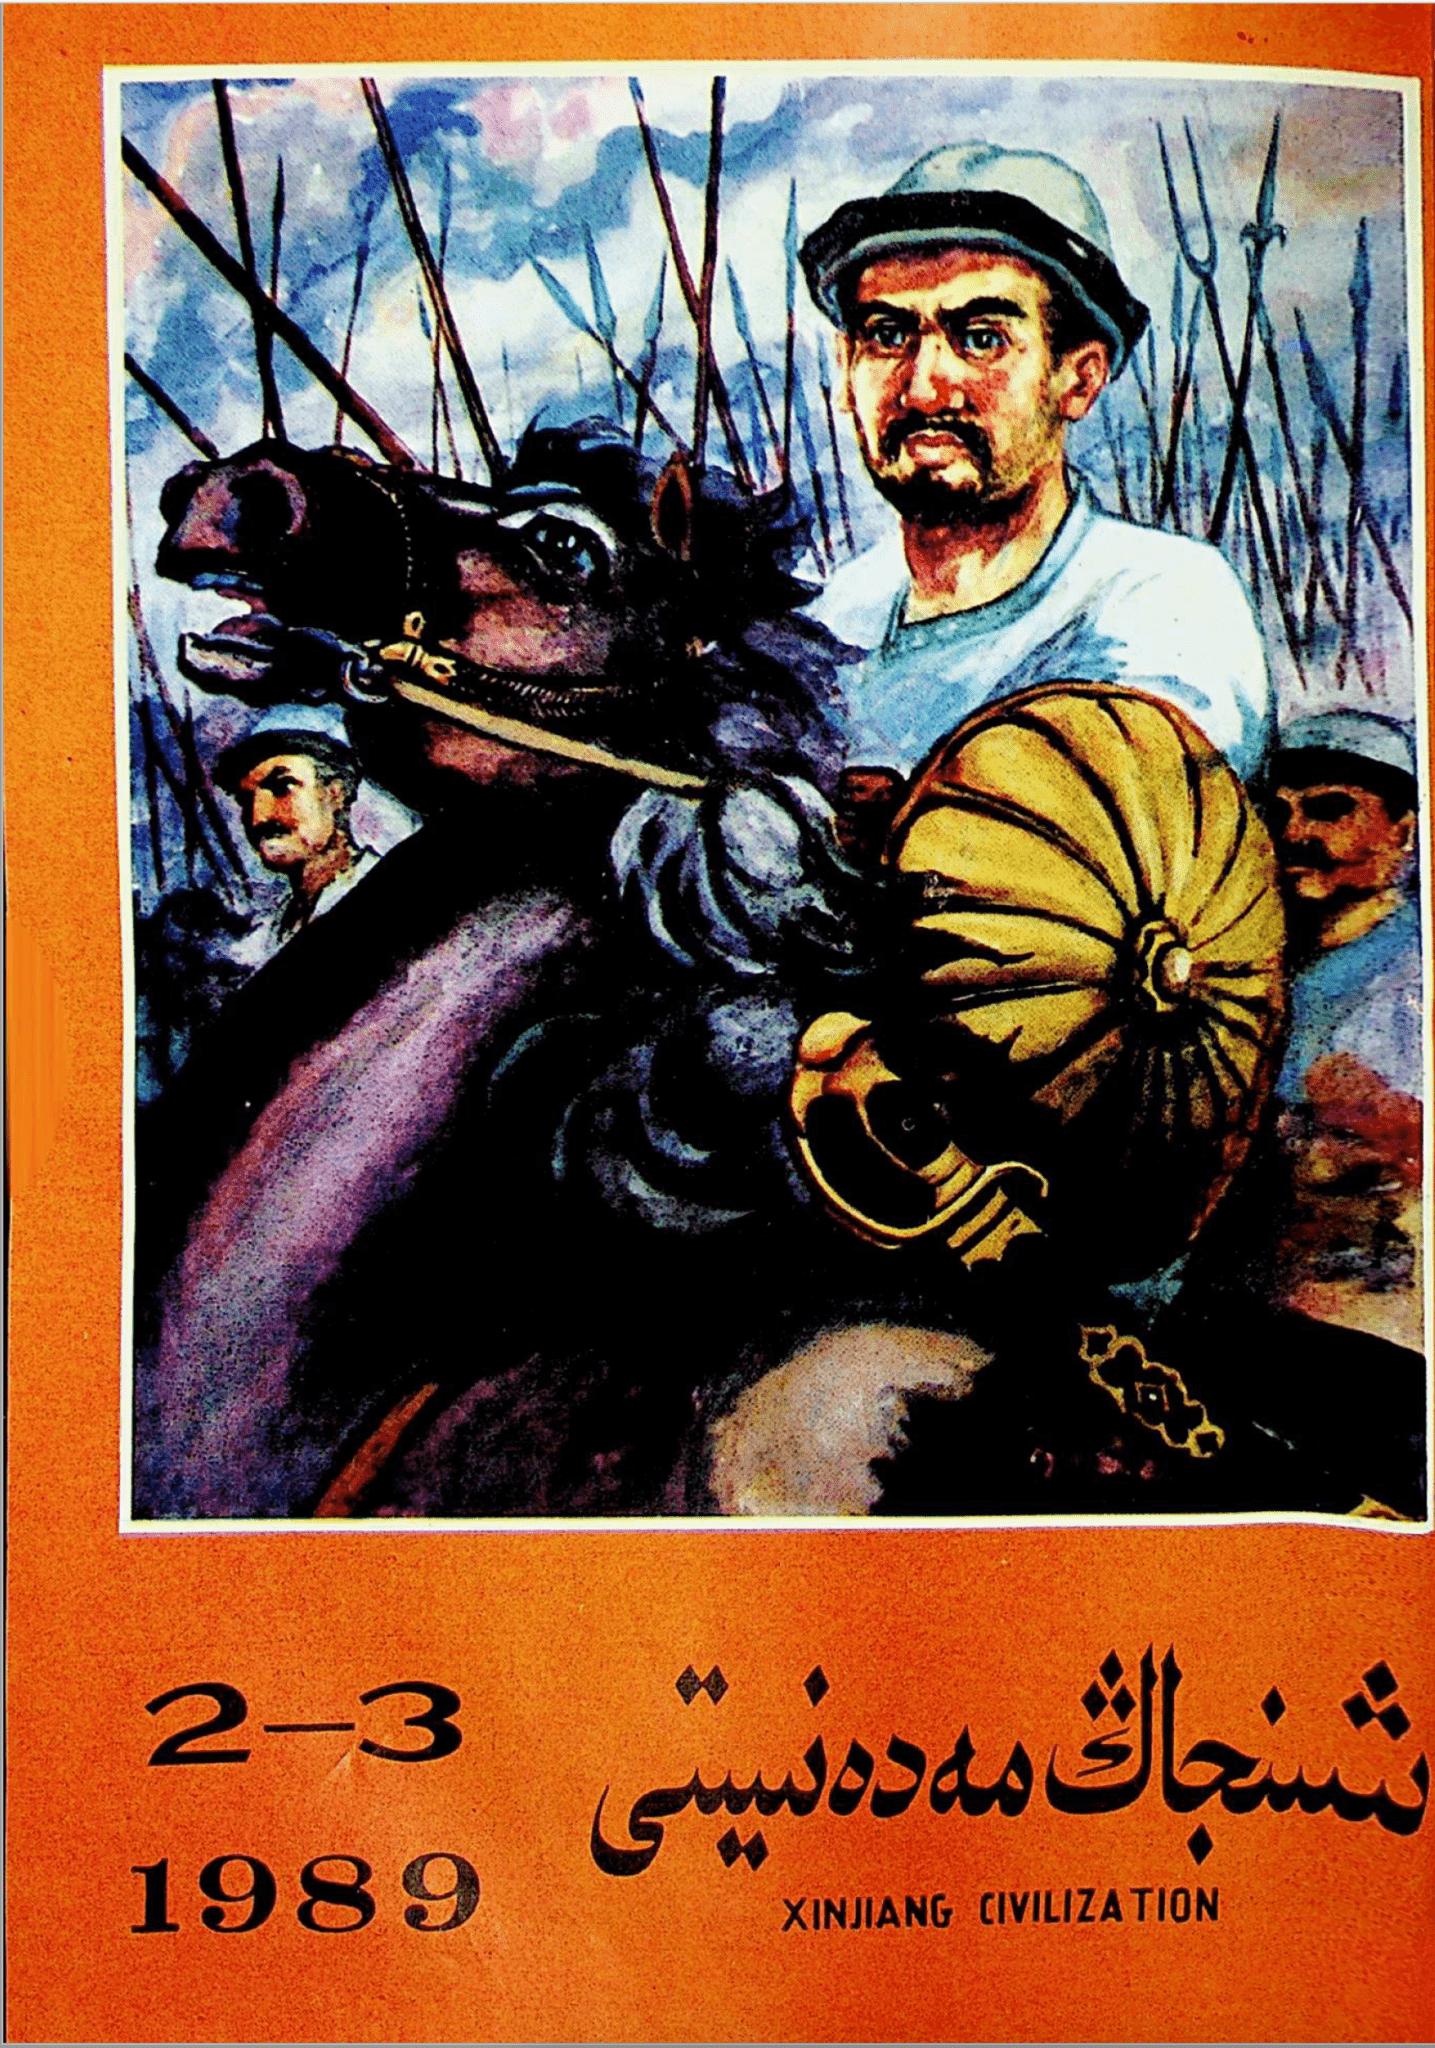 Screenshot 2020 03 05 at 15.29.09 - شىنجاڭ مەدەنىيىتى 1989-يىلى 2-3-سان